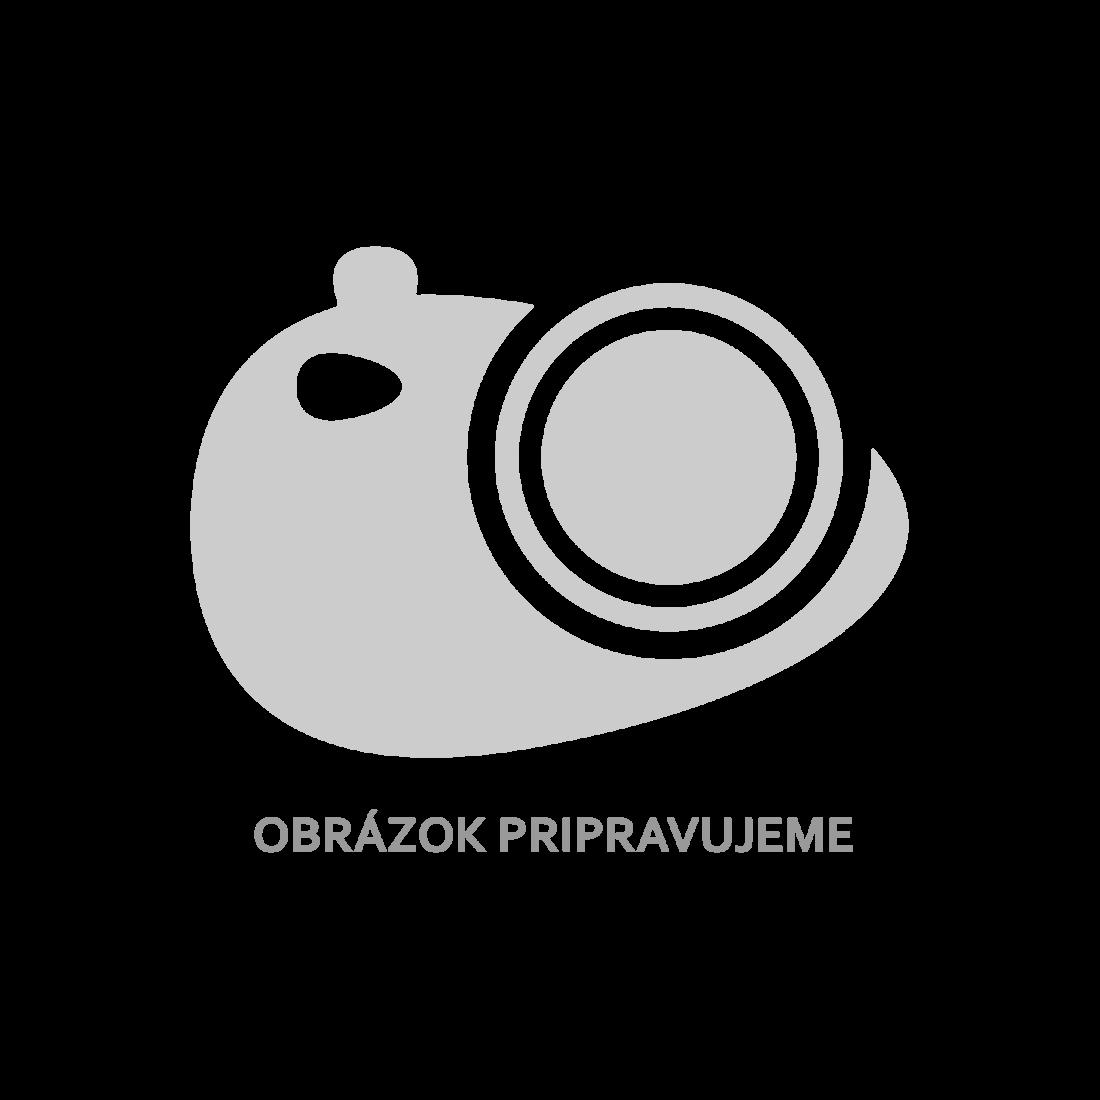 vidaXL Skříňka na CD betonově šedá 102 x 23 x 89,5 cm dřevotříska [801791]